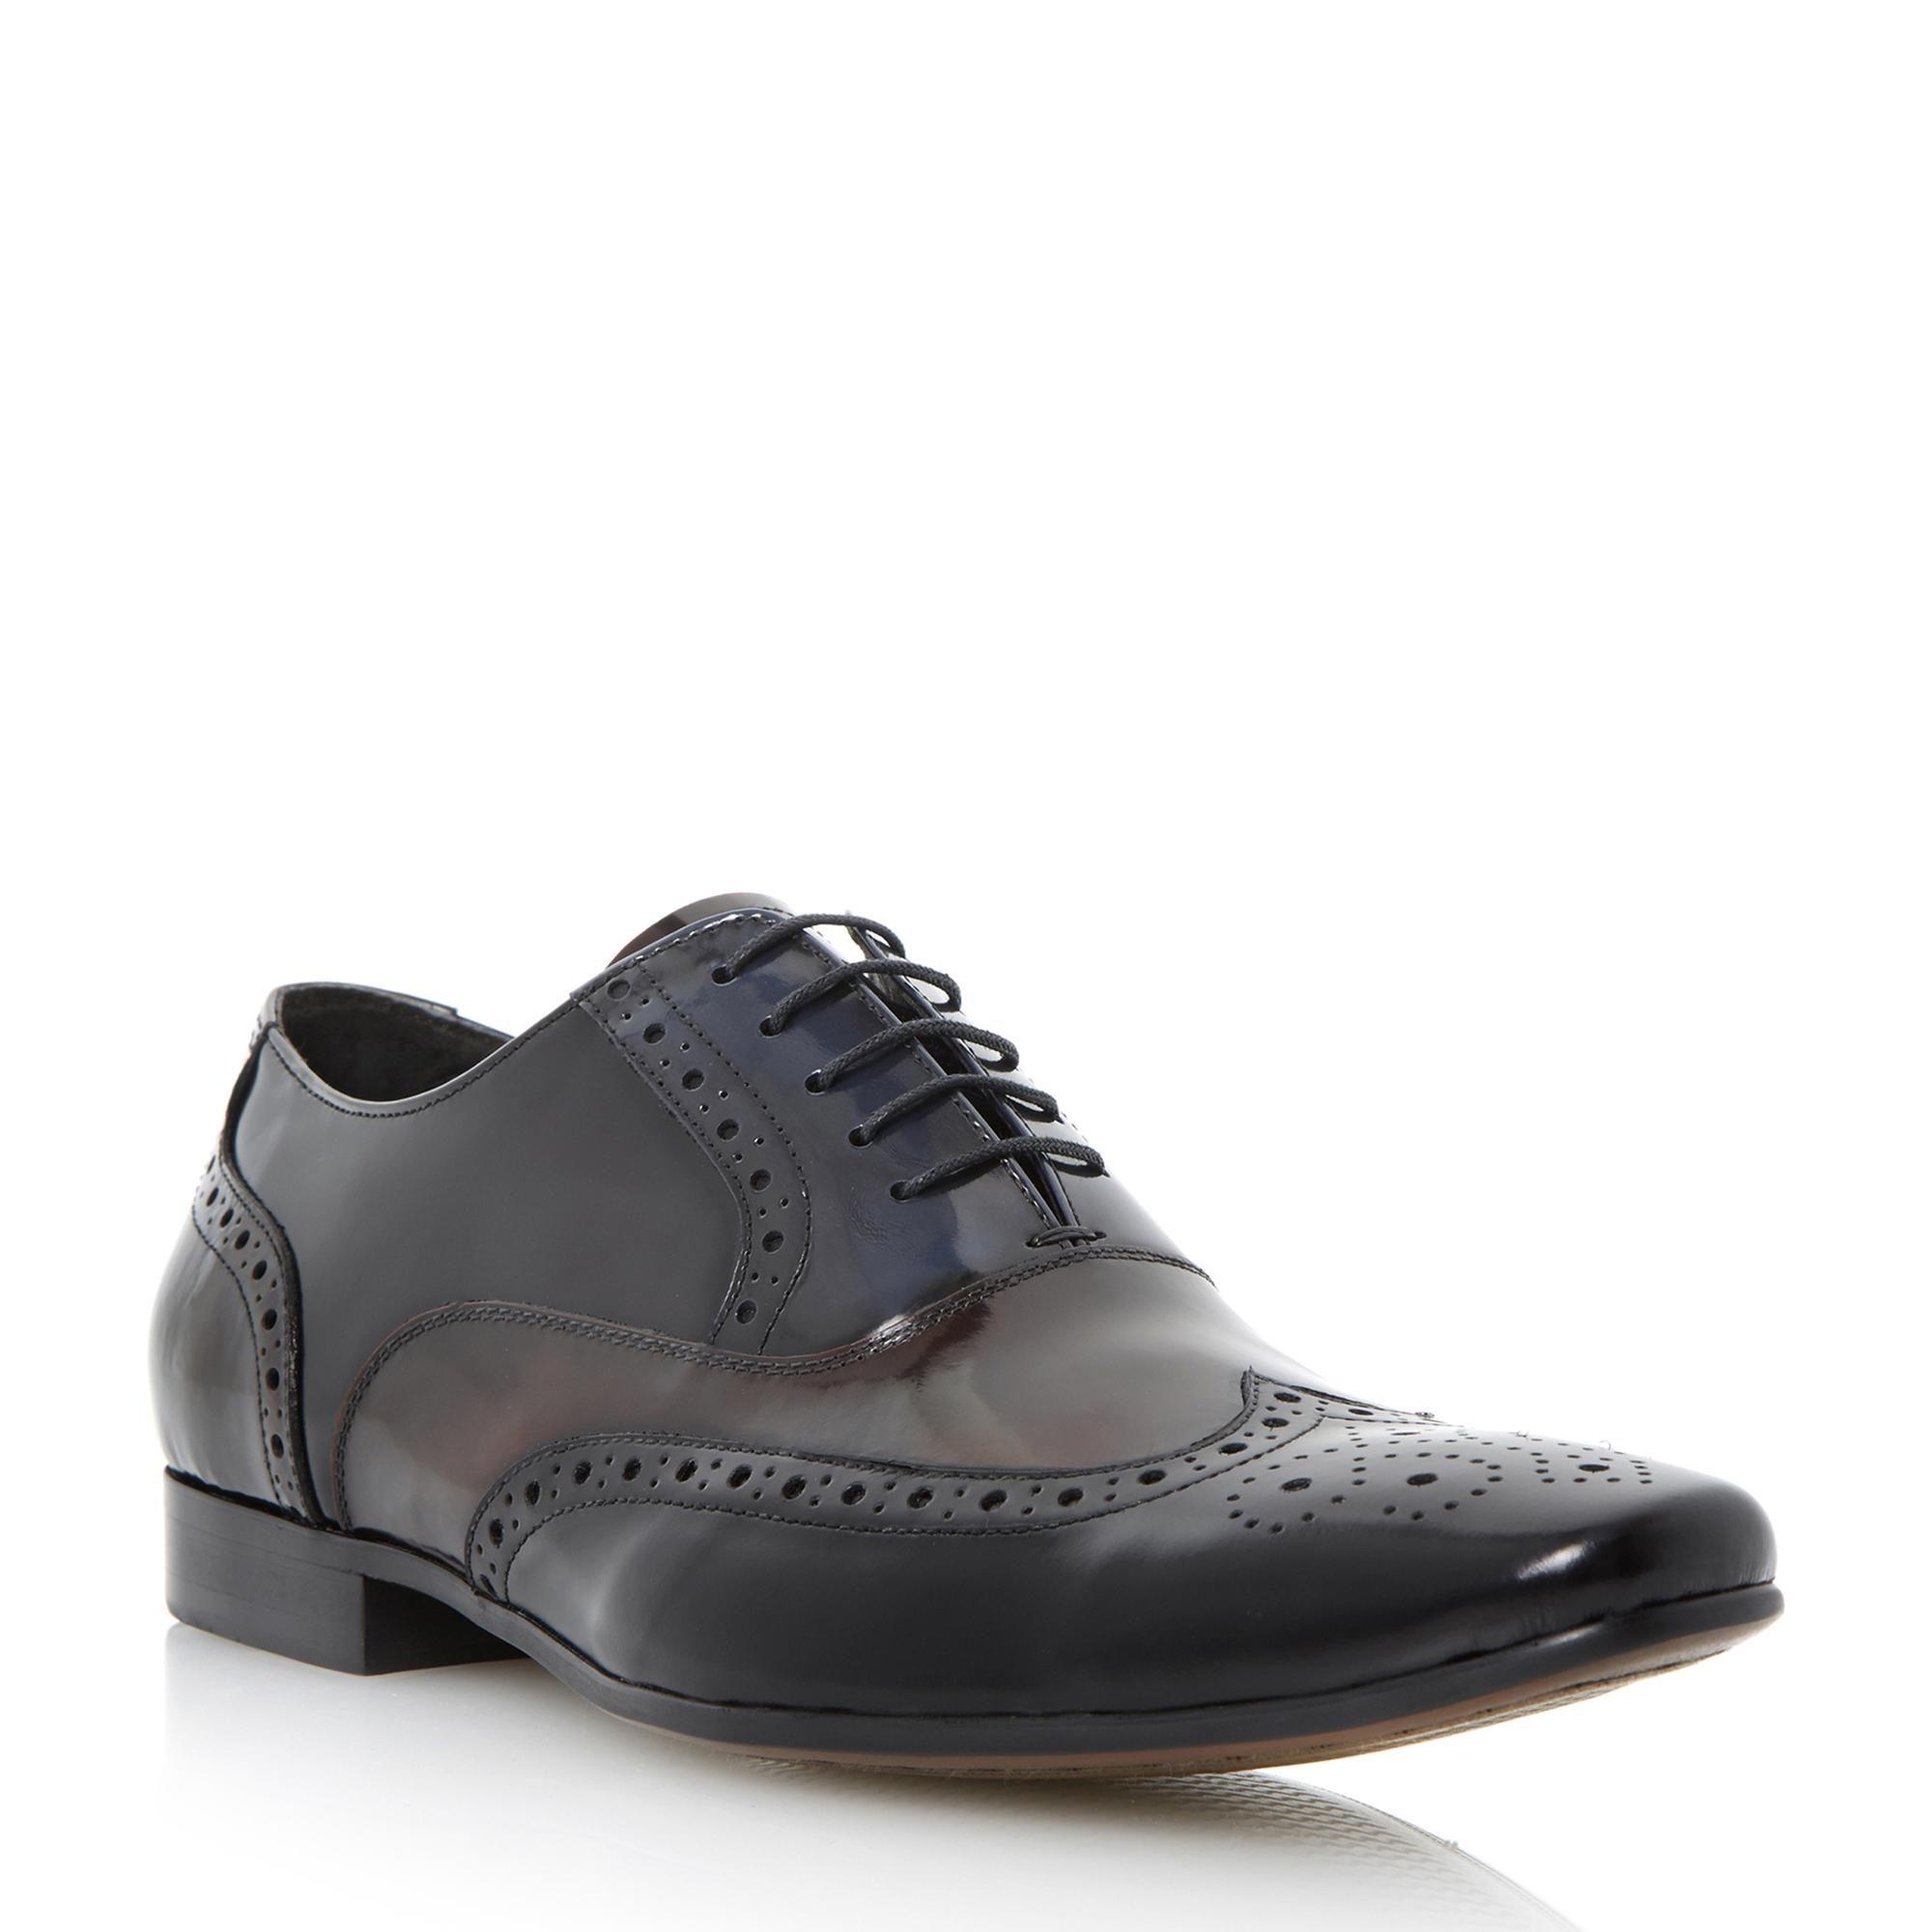 443856e858f8 DUNE MENS RAYMOND - Multi-Toned Polished Leather Brogue - multi | Dune Shoes  Online